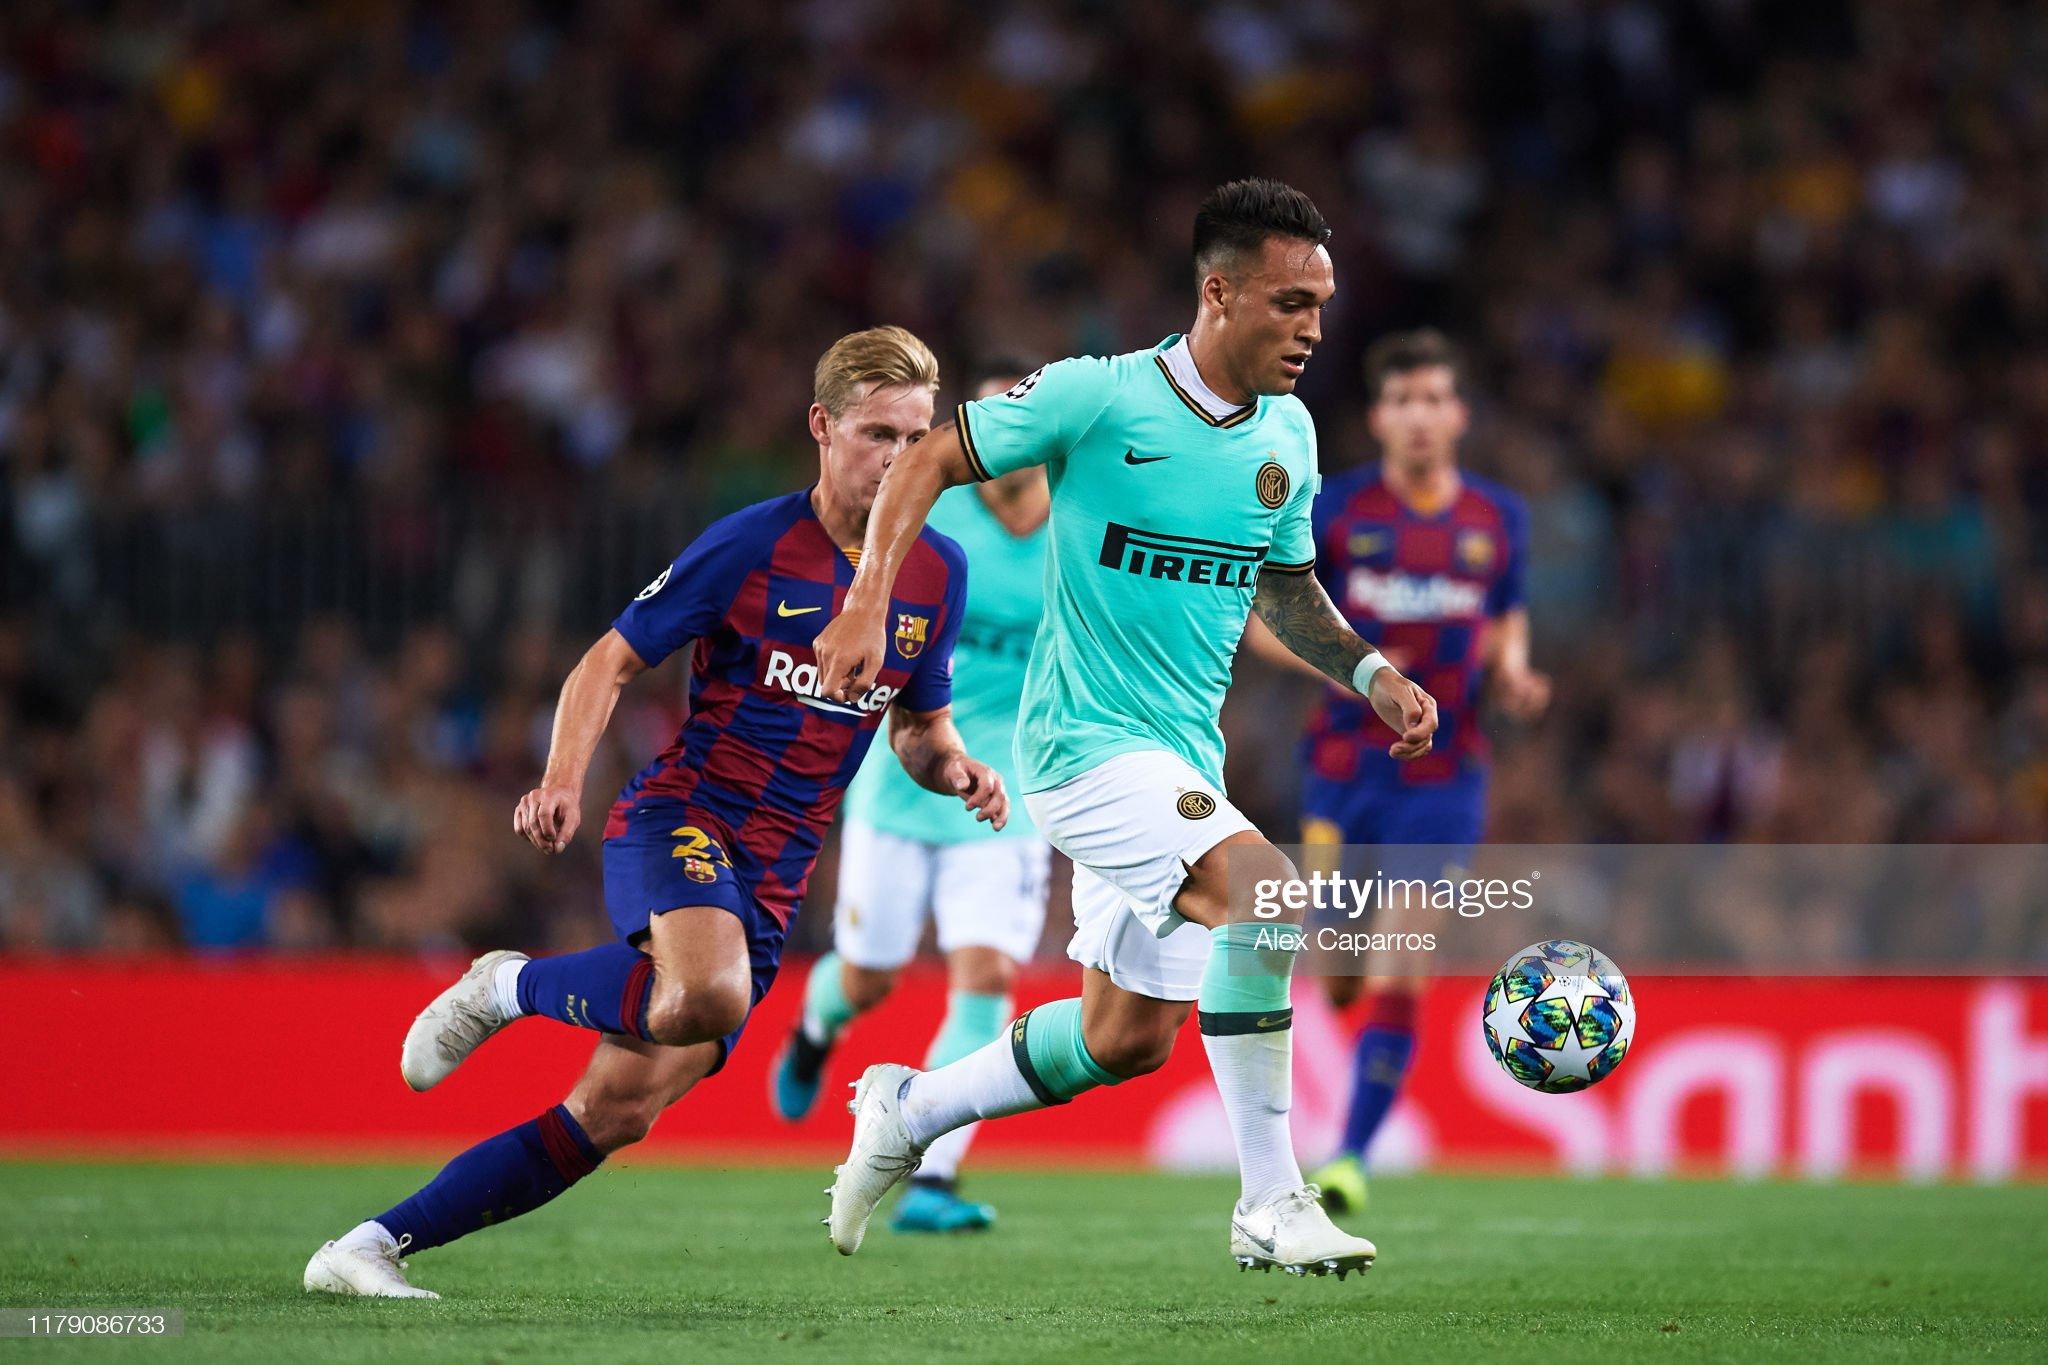 صور مباراة : برشلونة - إنتر 2-1 ( 02-10-2019 )  Lautaro-martinez-of-inter-runs-with-the-ball-followed-by-frenkie-de-picture-id1179086733?s=2048x2048